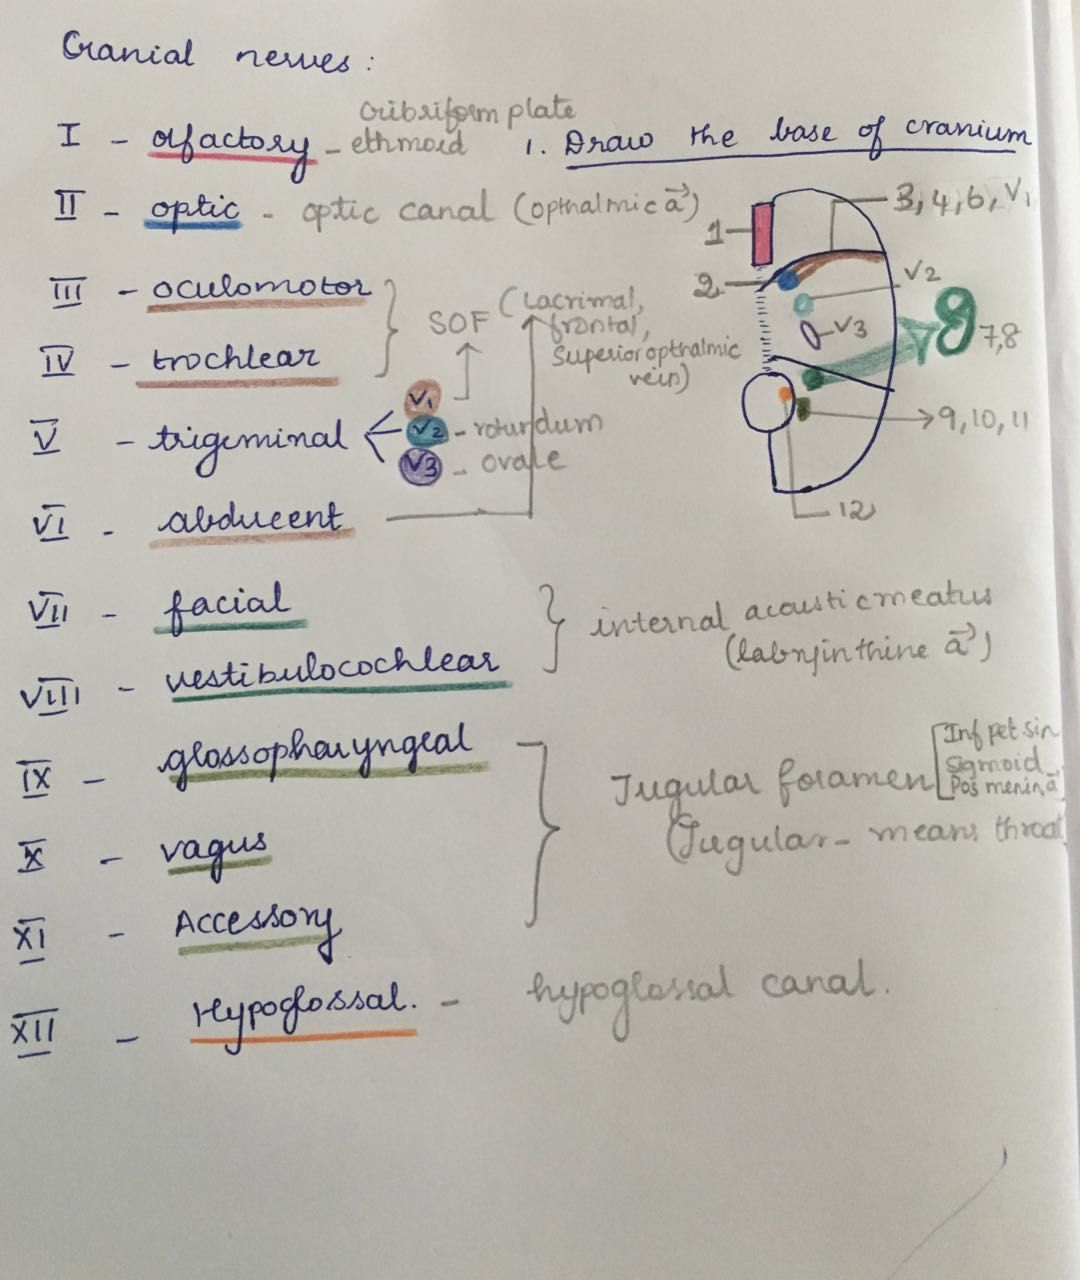 cranial nerve foramen mnemonic - Google Search | Cranial ...